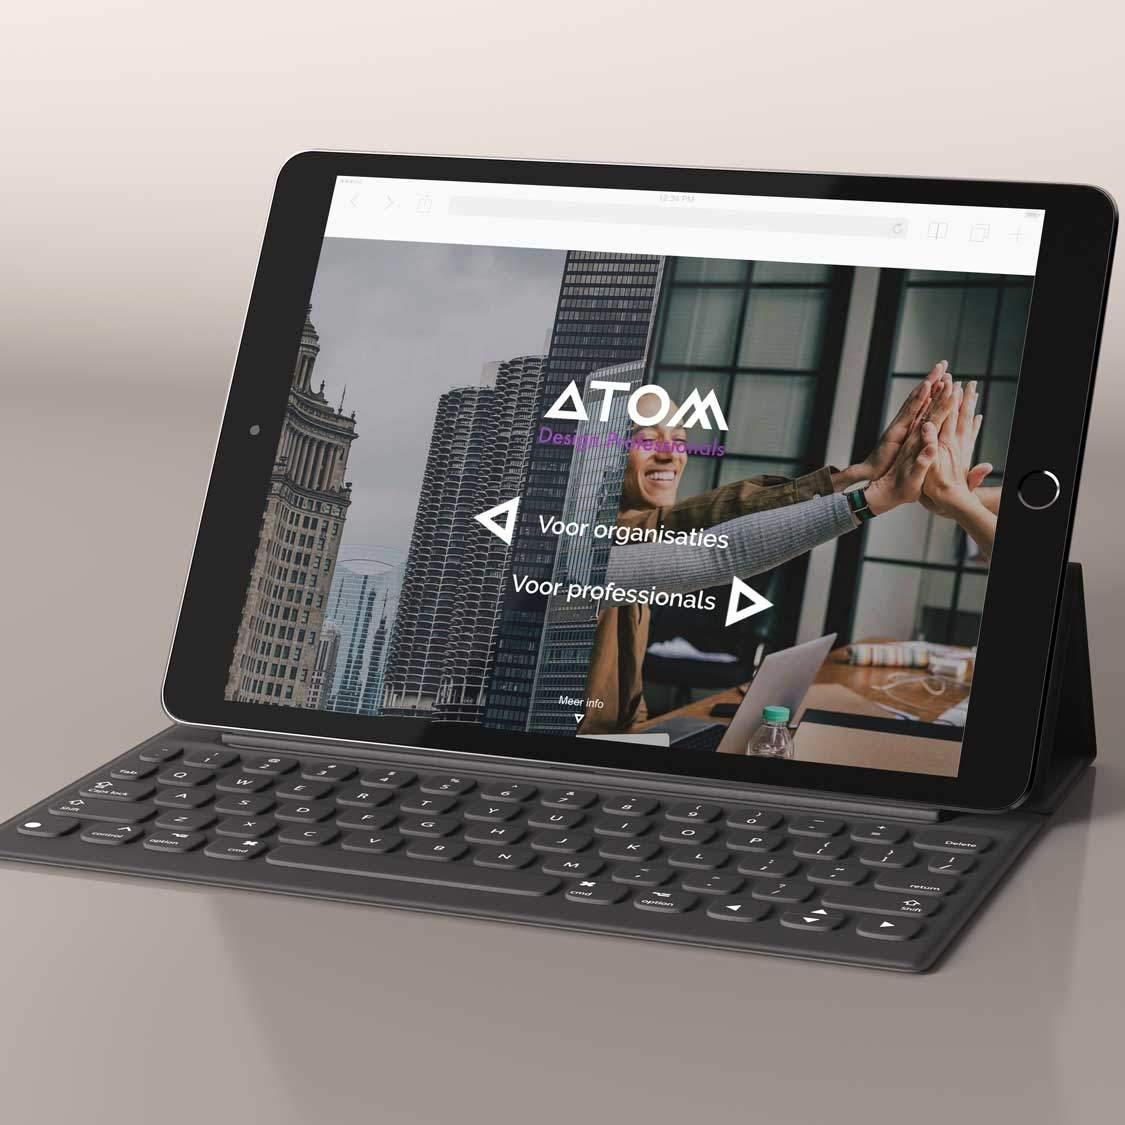 atom-design-professionals-online-marketing-bureau-webdevelopment-haarlem-made-marketing-2